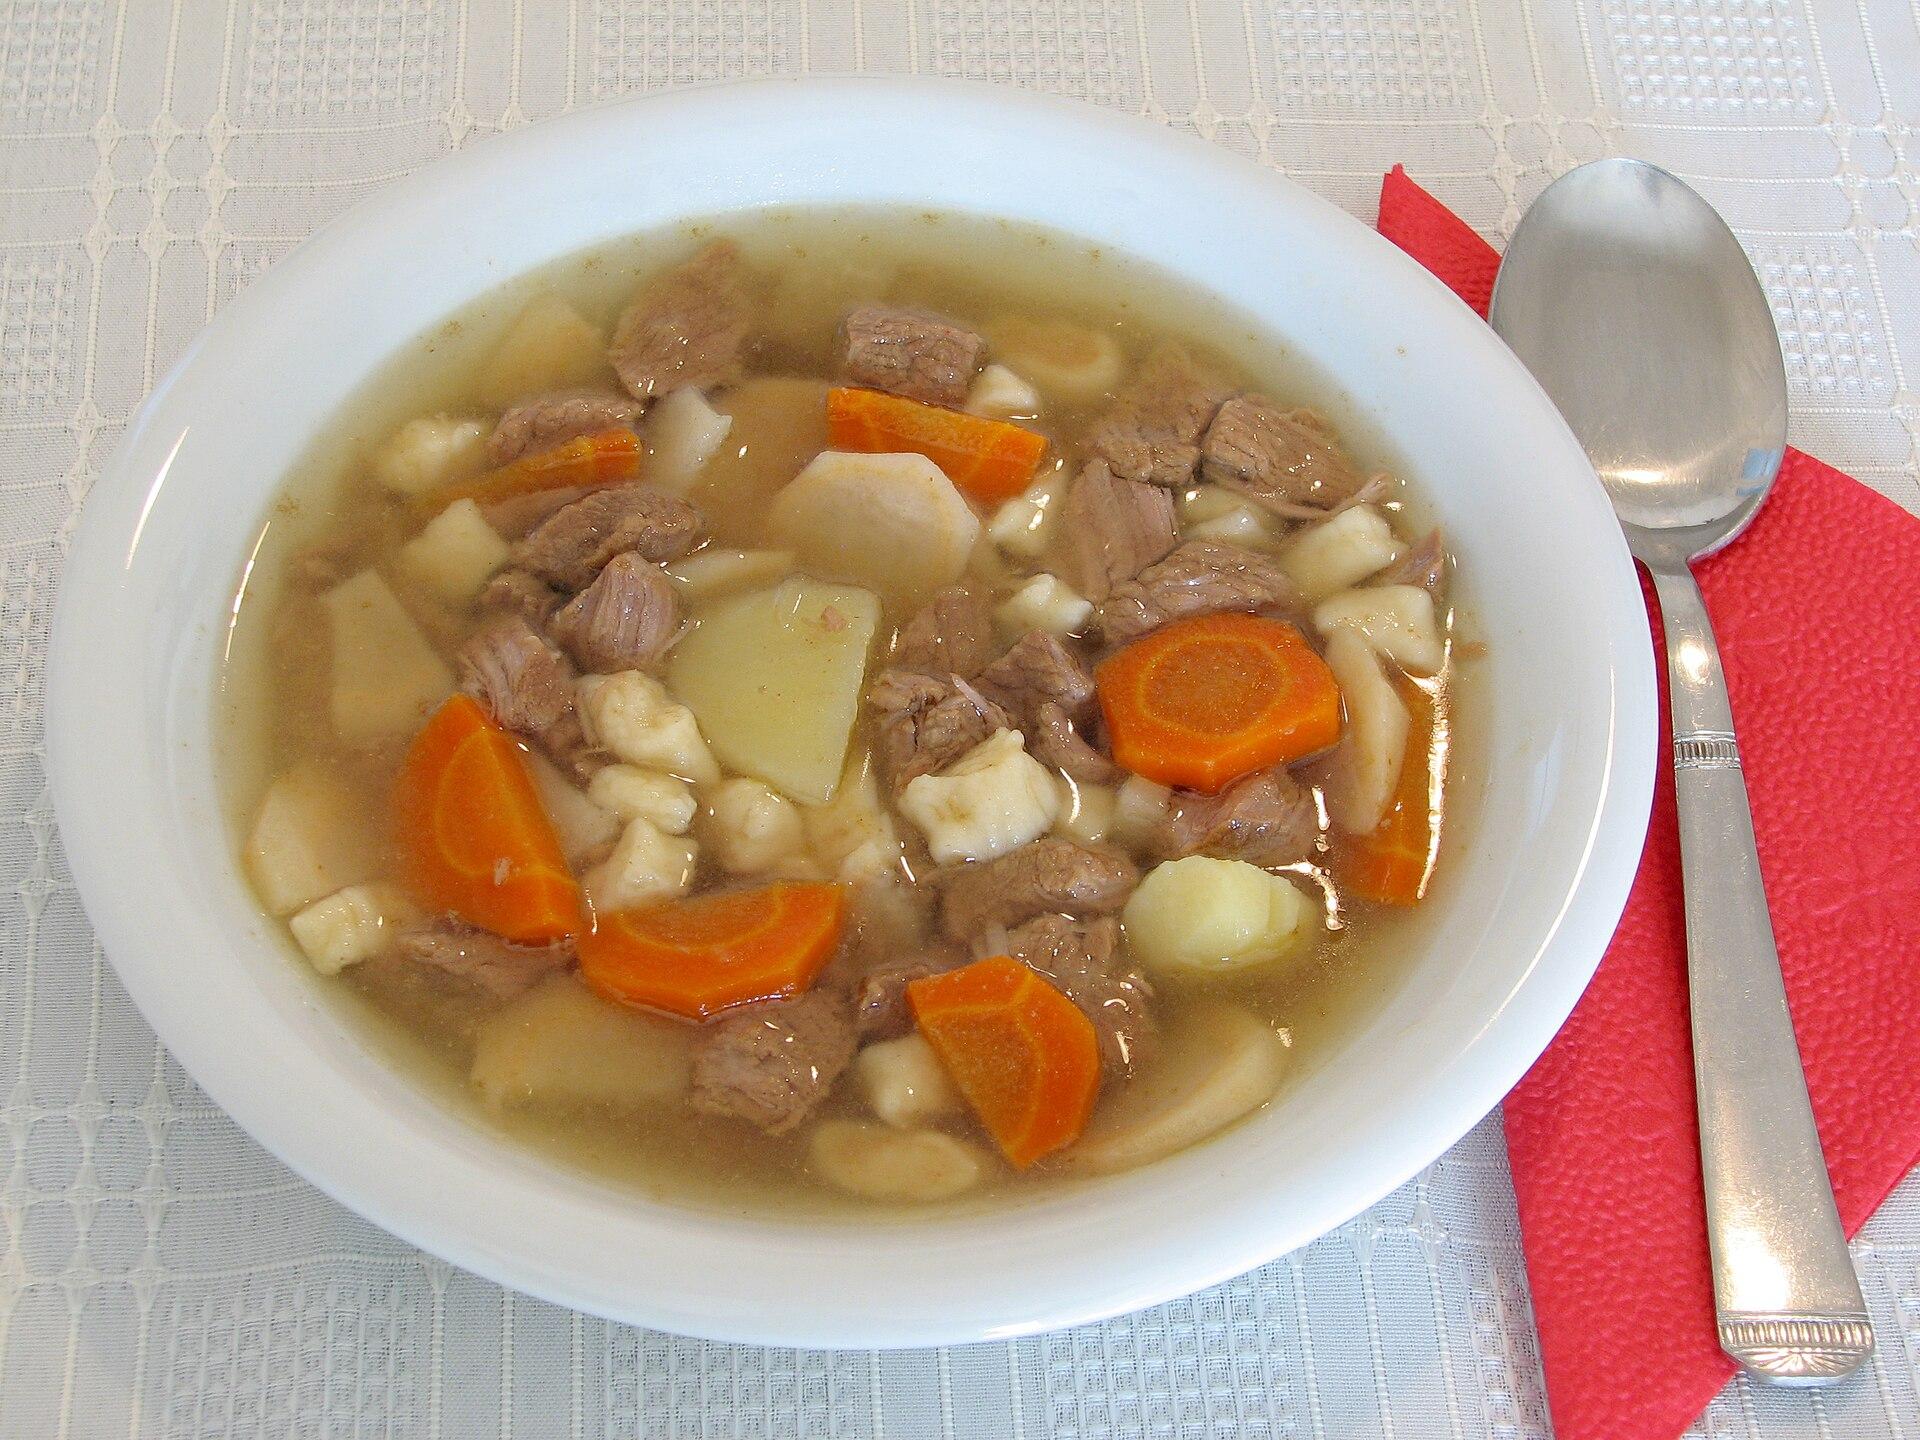 hungarian cuisine wikipedia